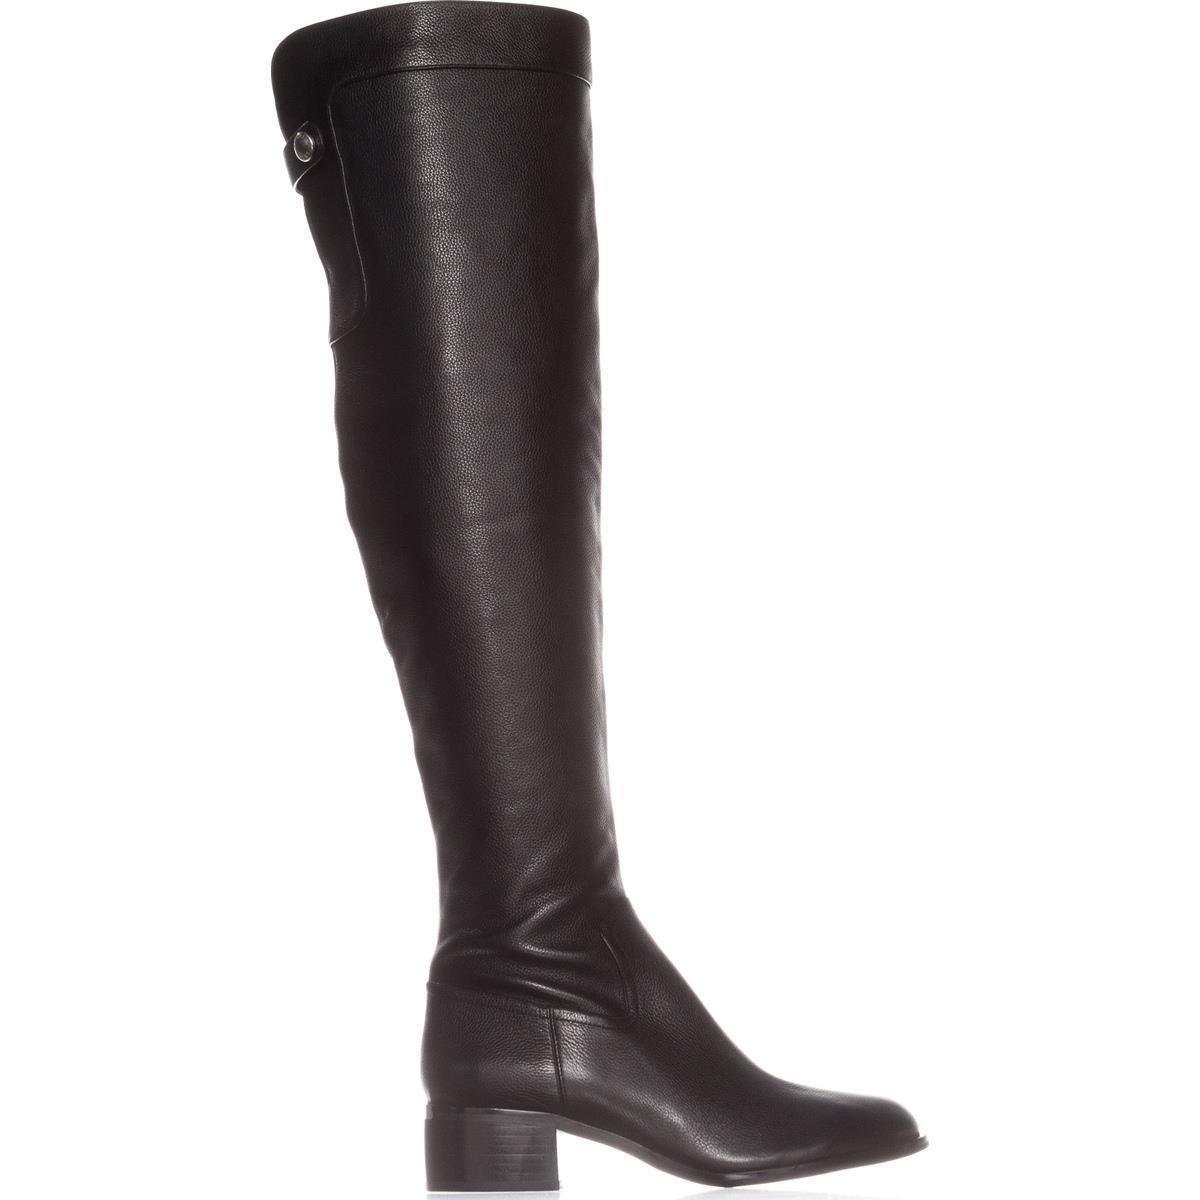 efccc90c9c2 Michael Michael Kors Women s Finn Over-The-Knee Boots  Amazon.co.uk  Shoes    Bags